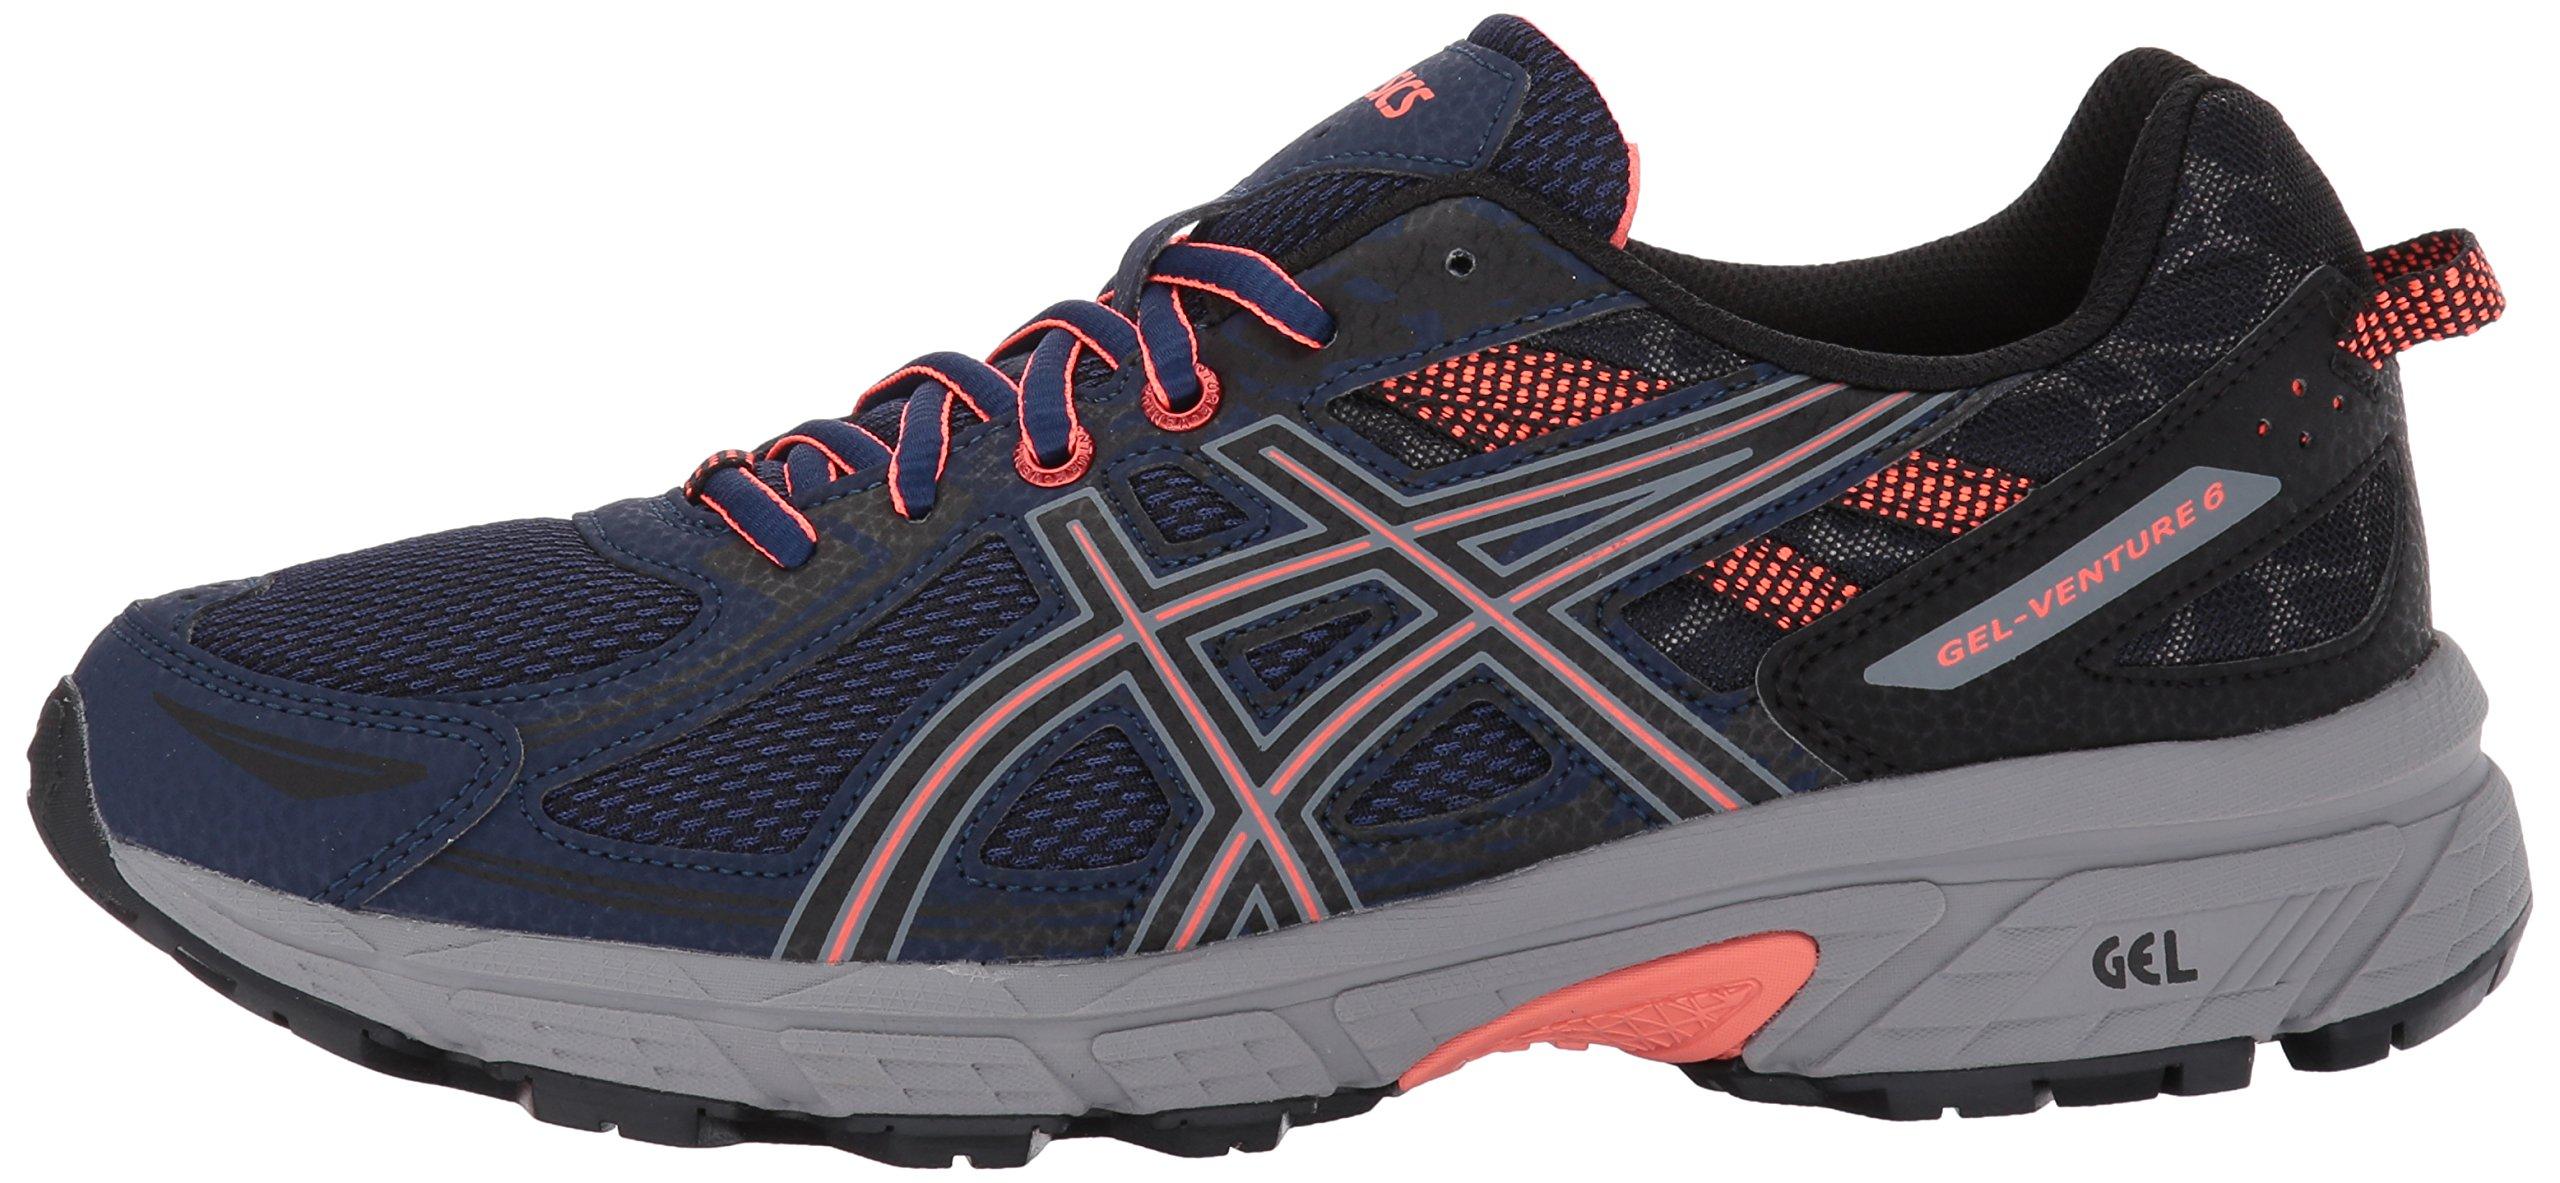 ASICS Women's Gel-Venture 6 Running-Shoes,Indigo Blue/Black/Coral,5 Medium US by ASICS (Image #5)